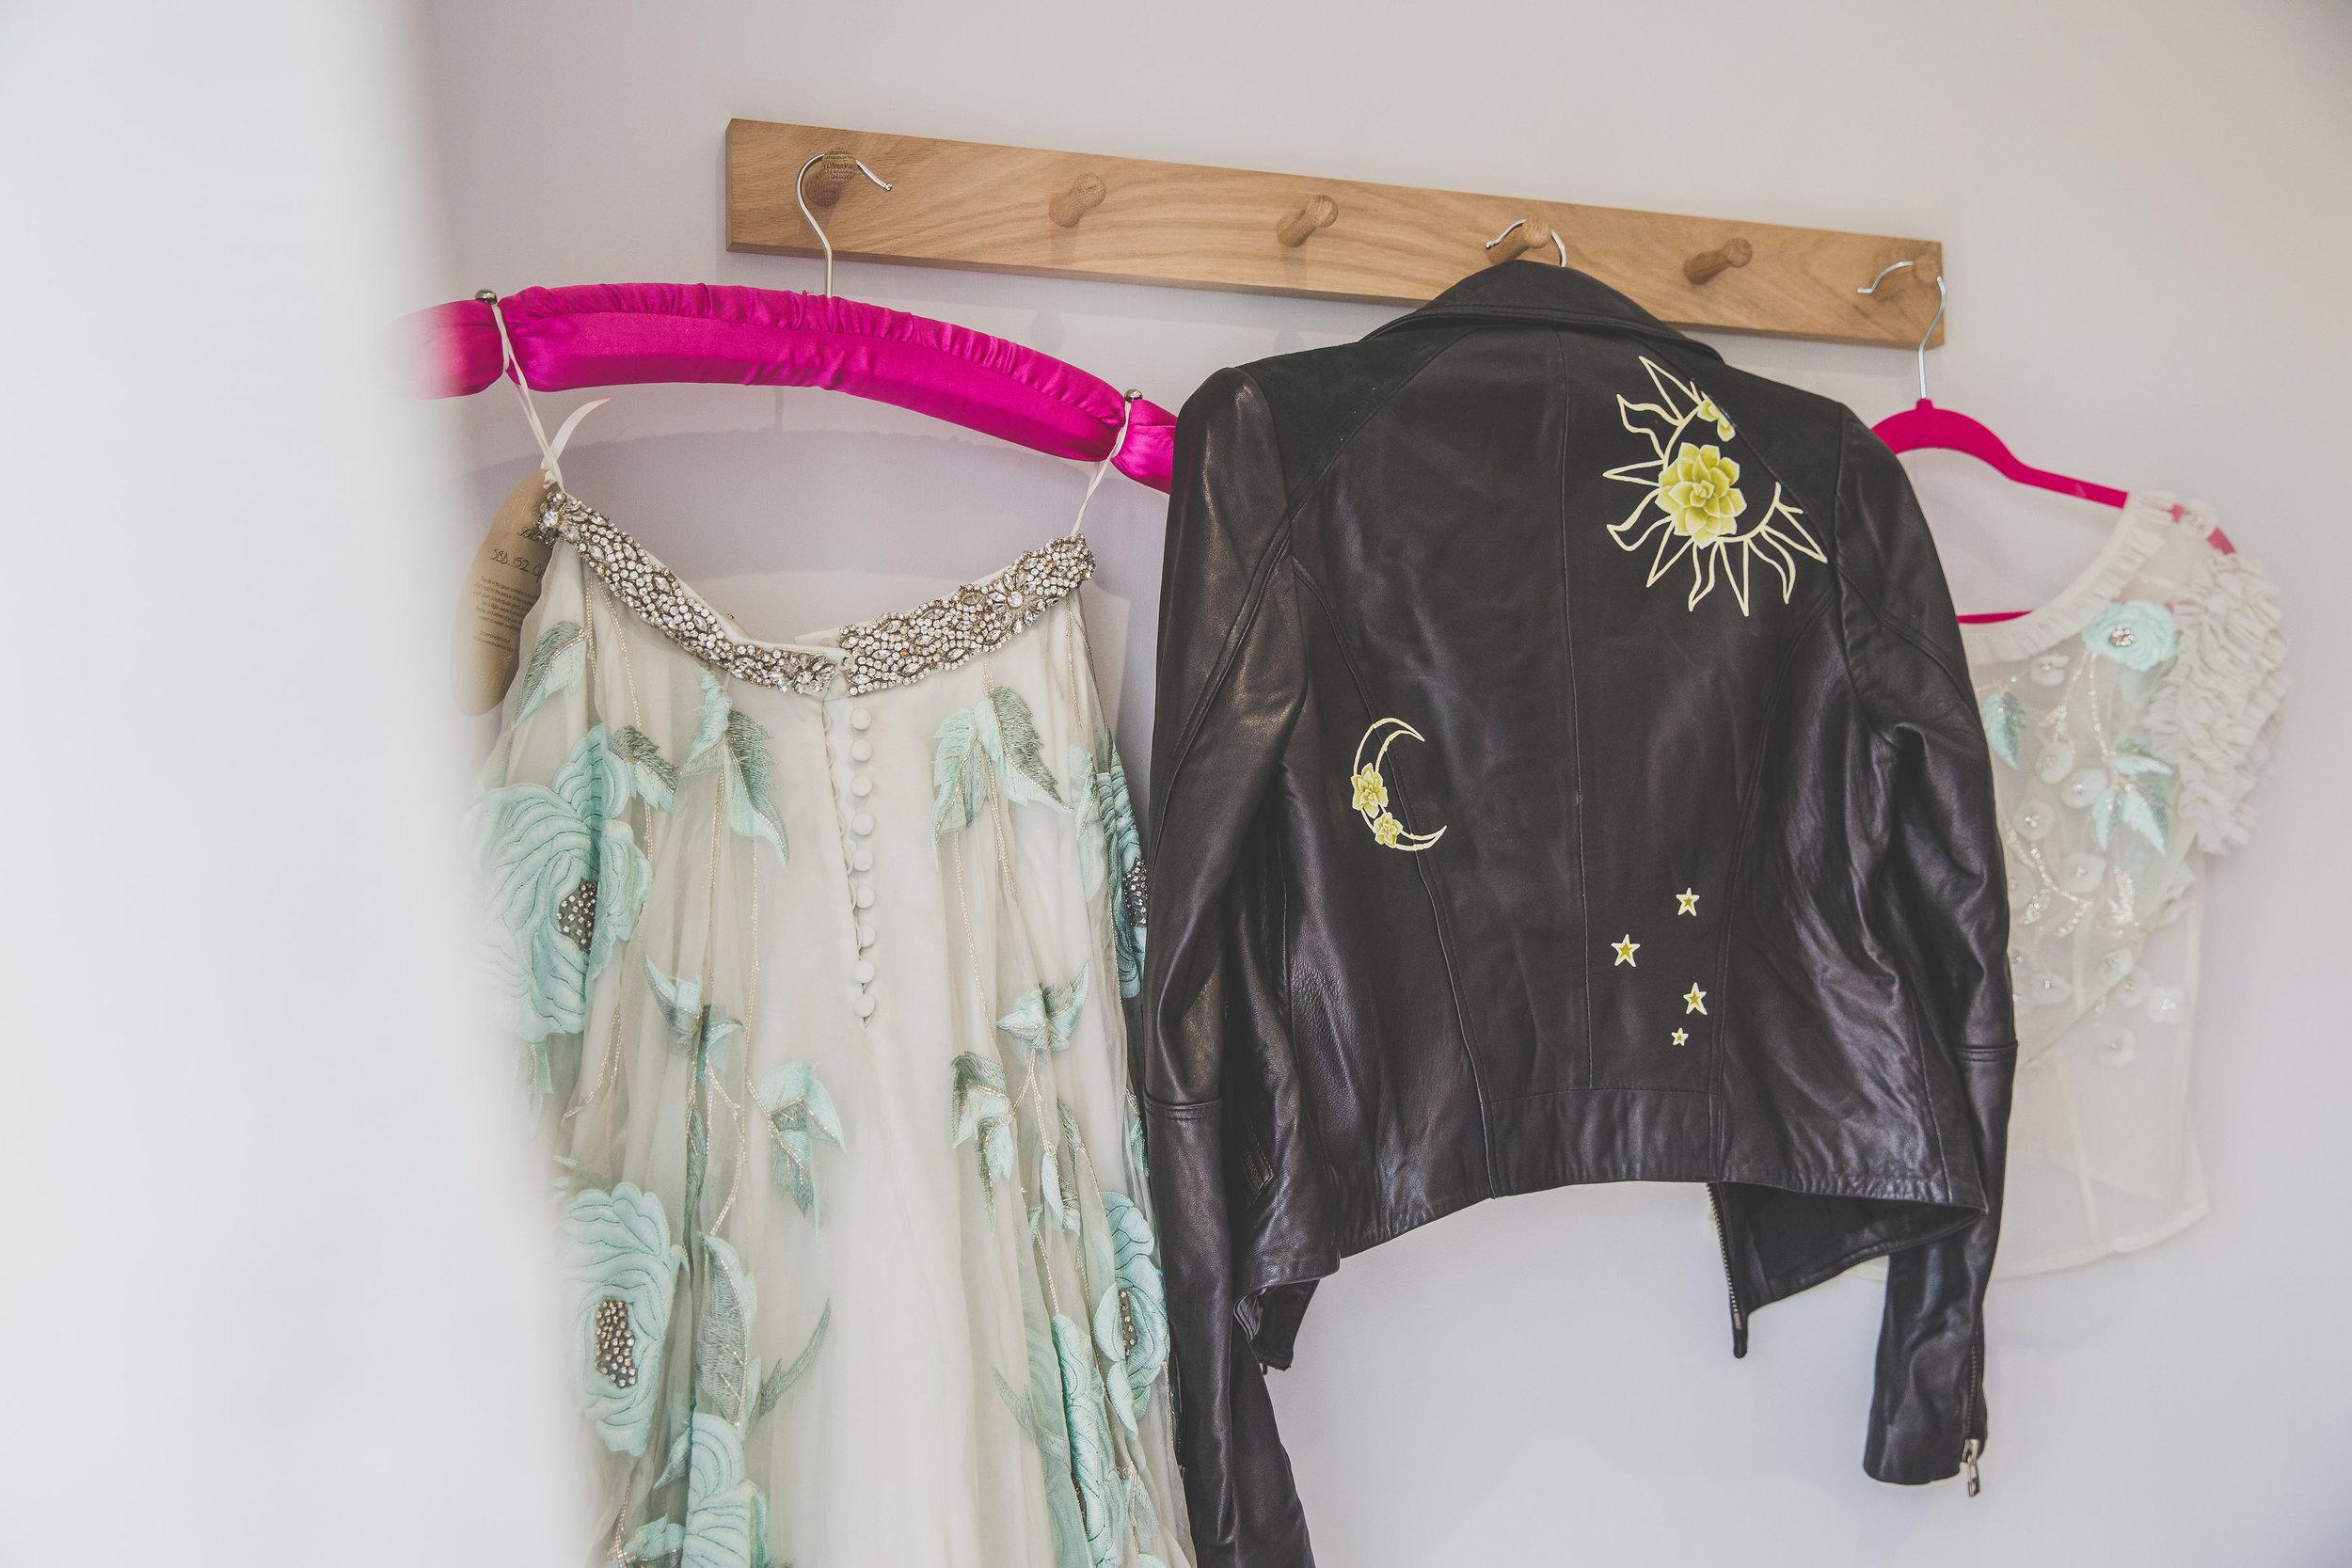 Nicki Shea Photography Bowen Dryden Separates     Elizabeth Rose Hand painted succulent design bridal leather jacket